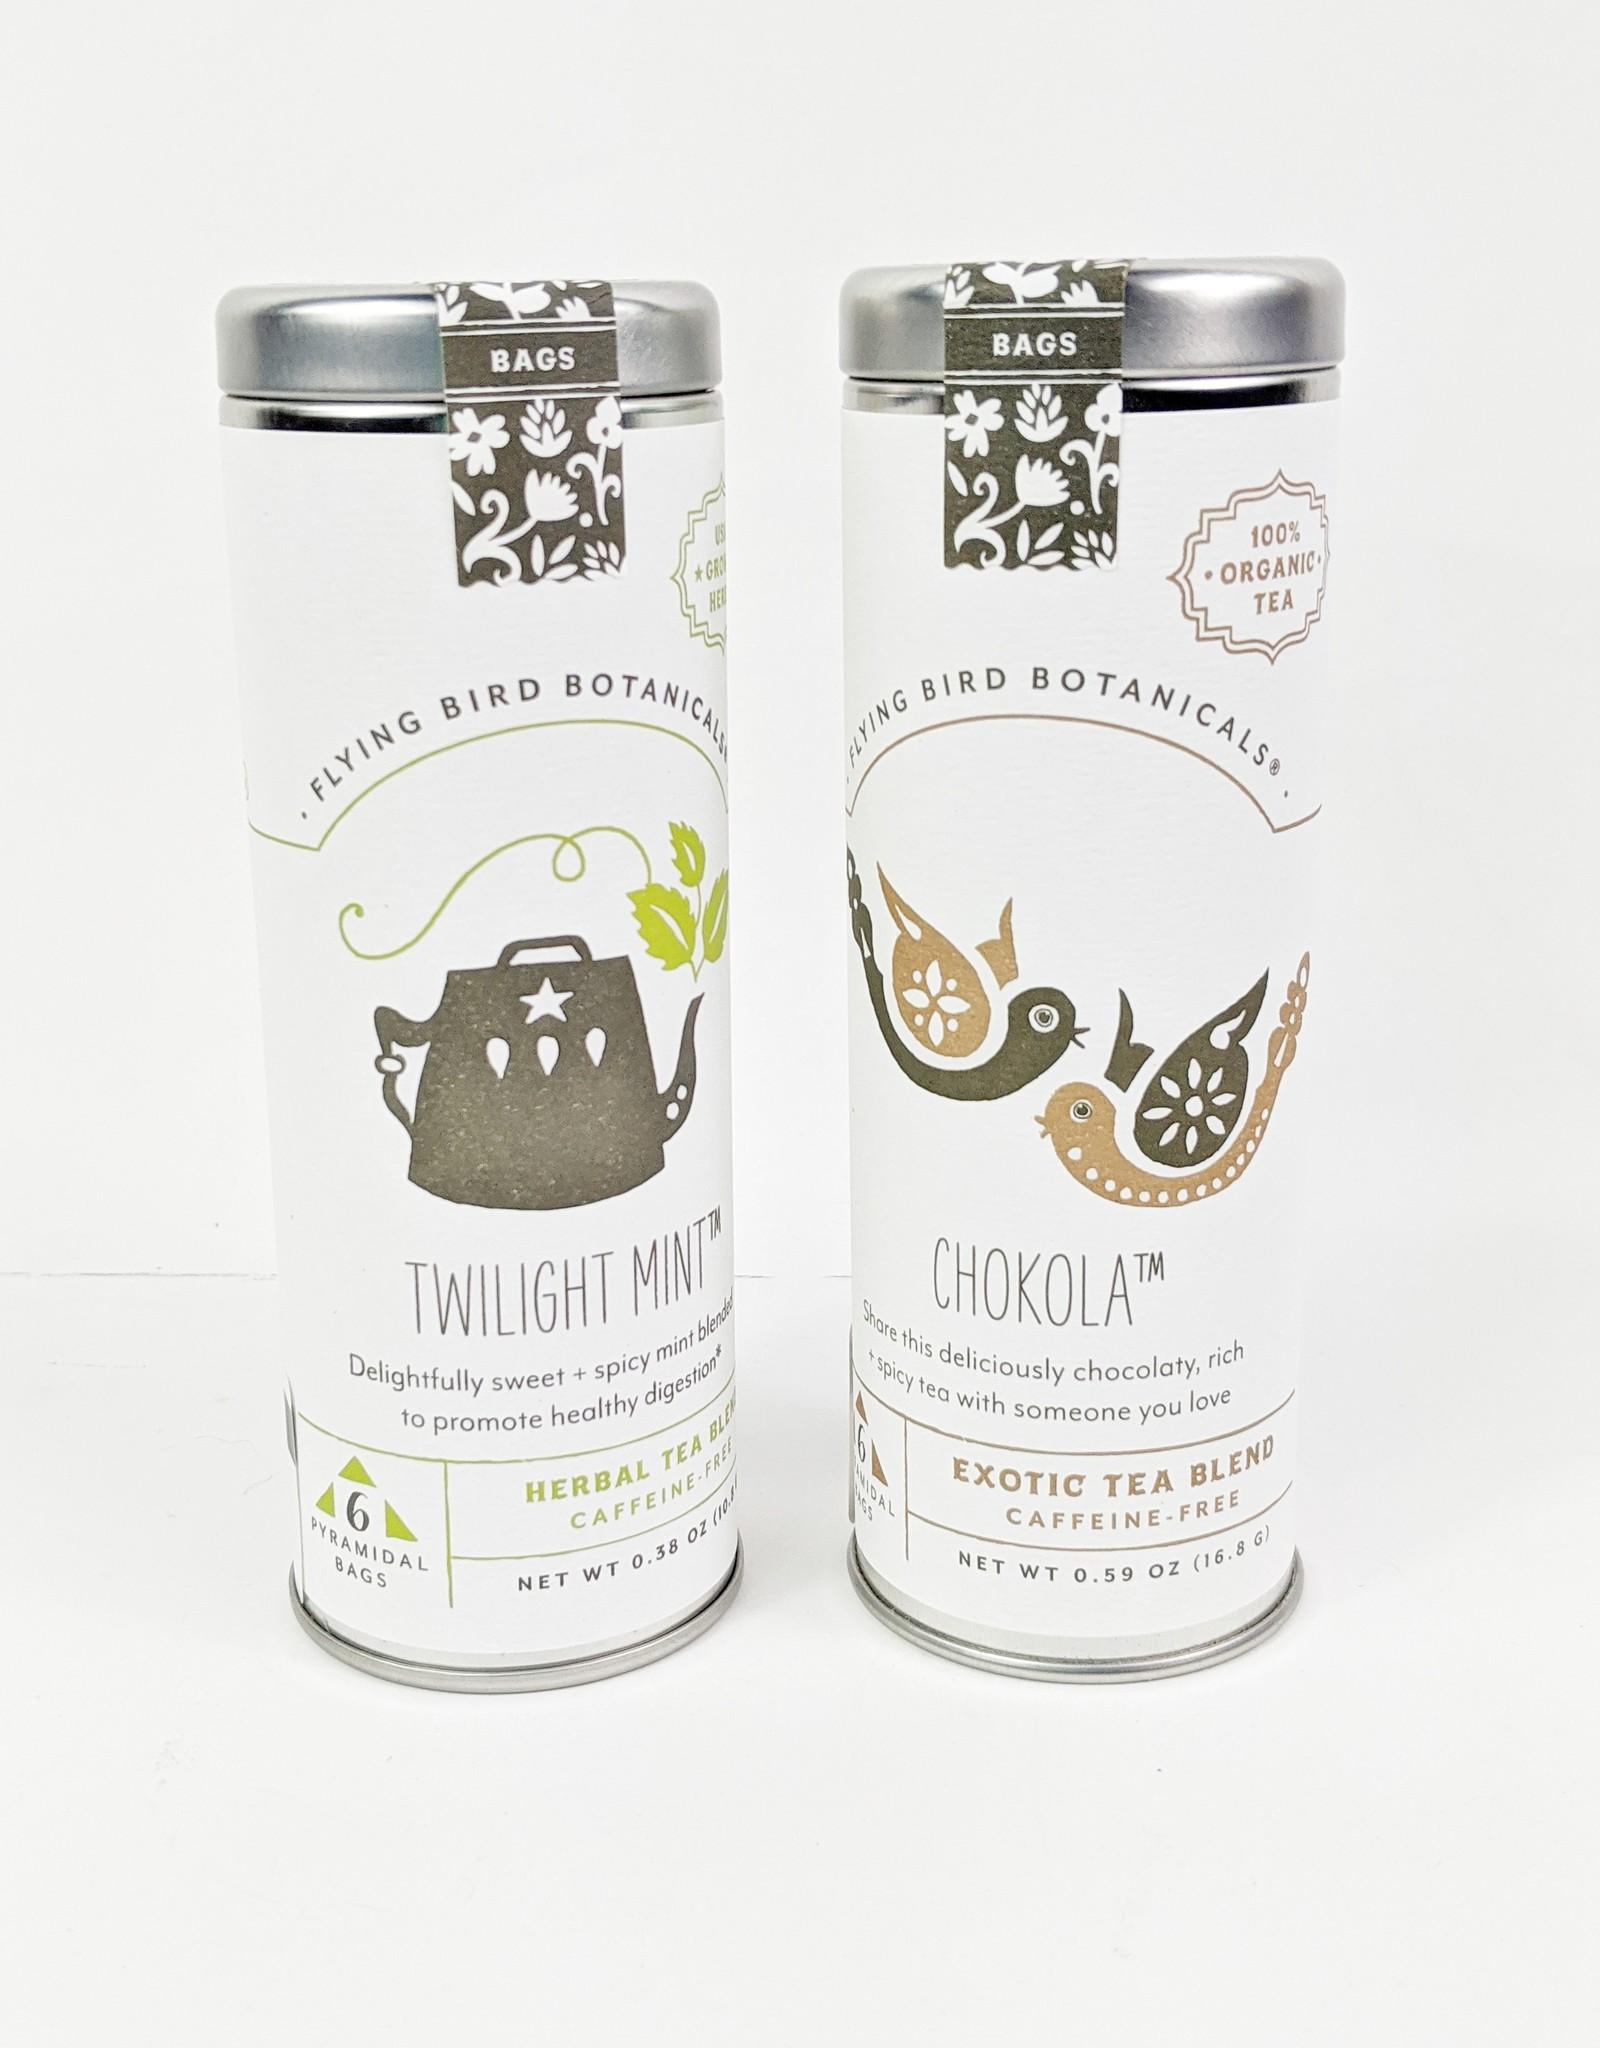 Flying Bird Twilight Mint Tea